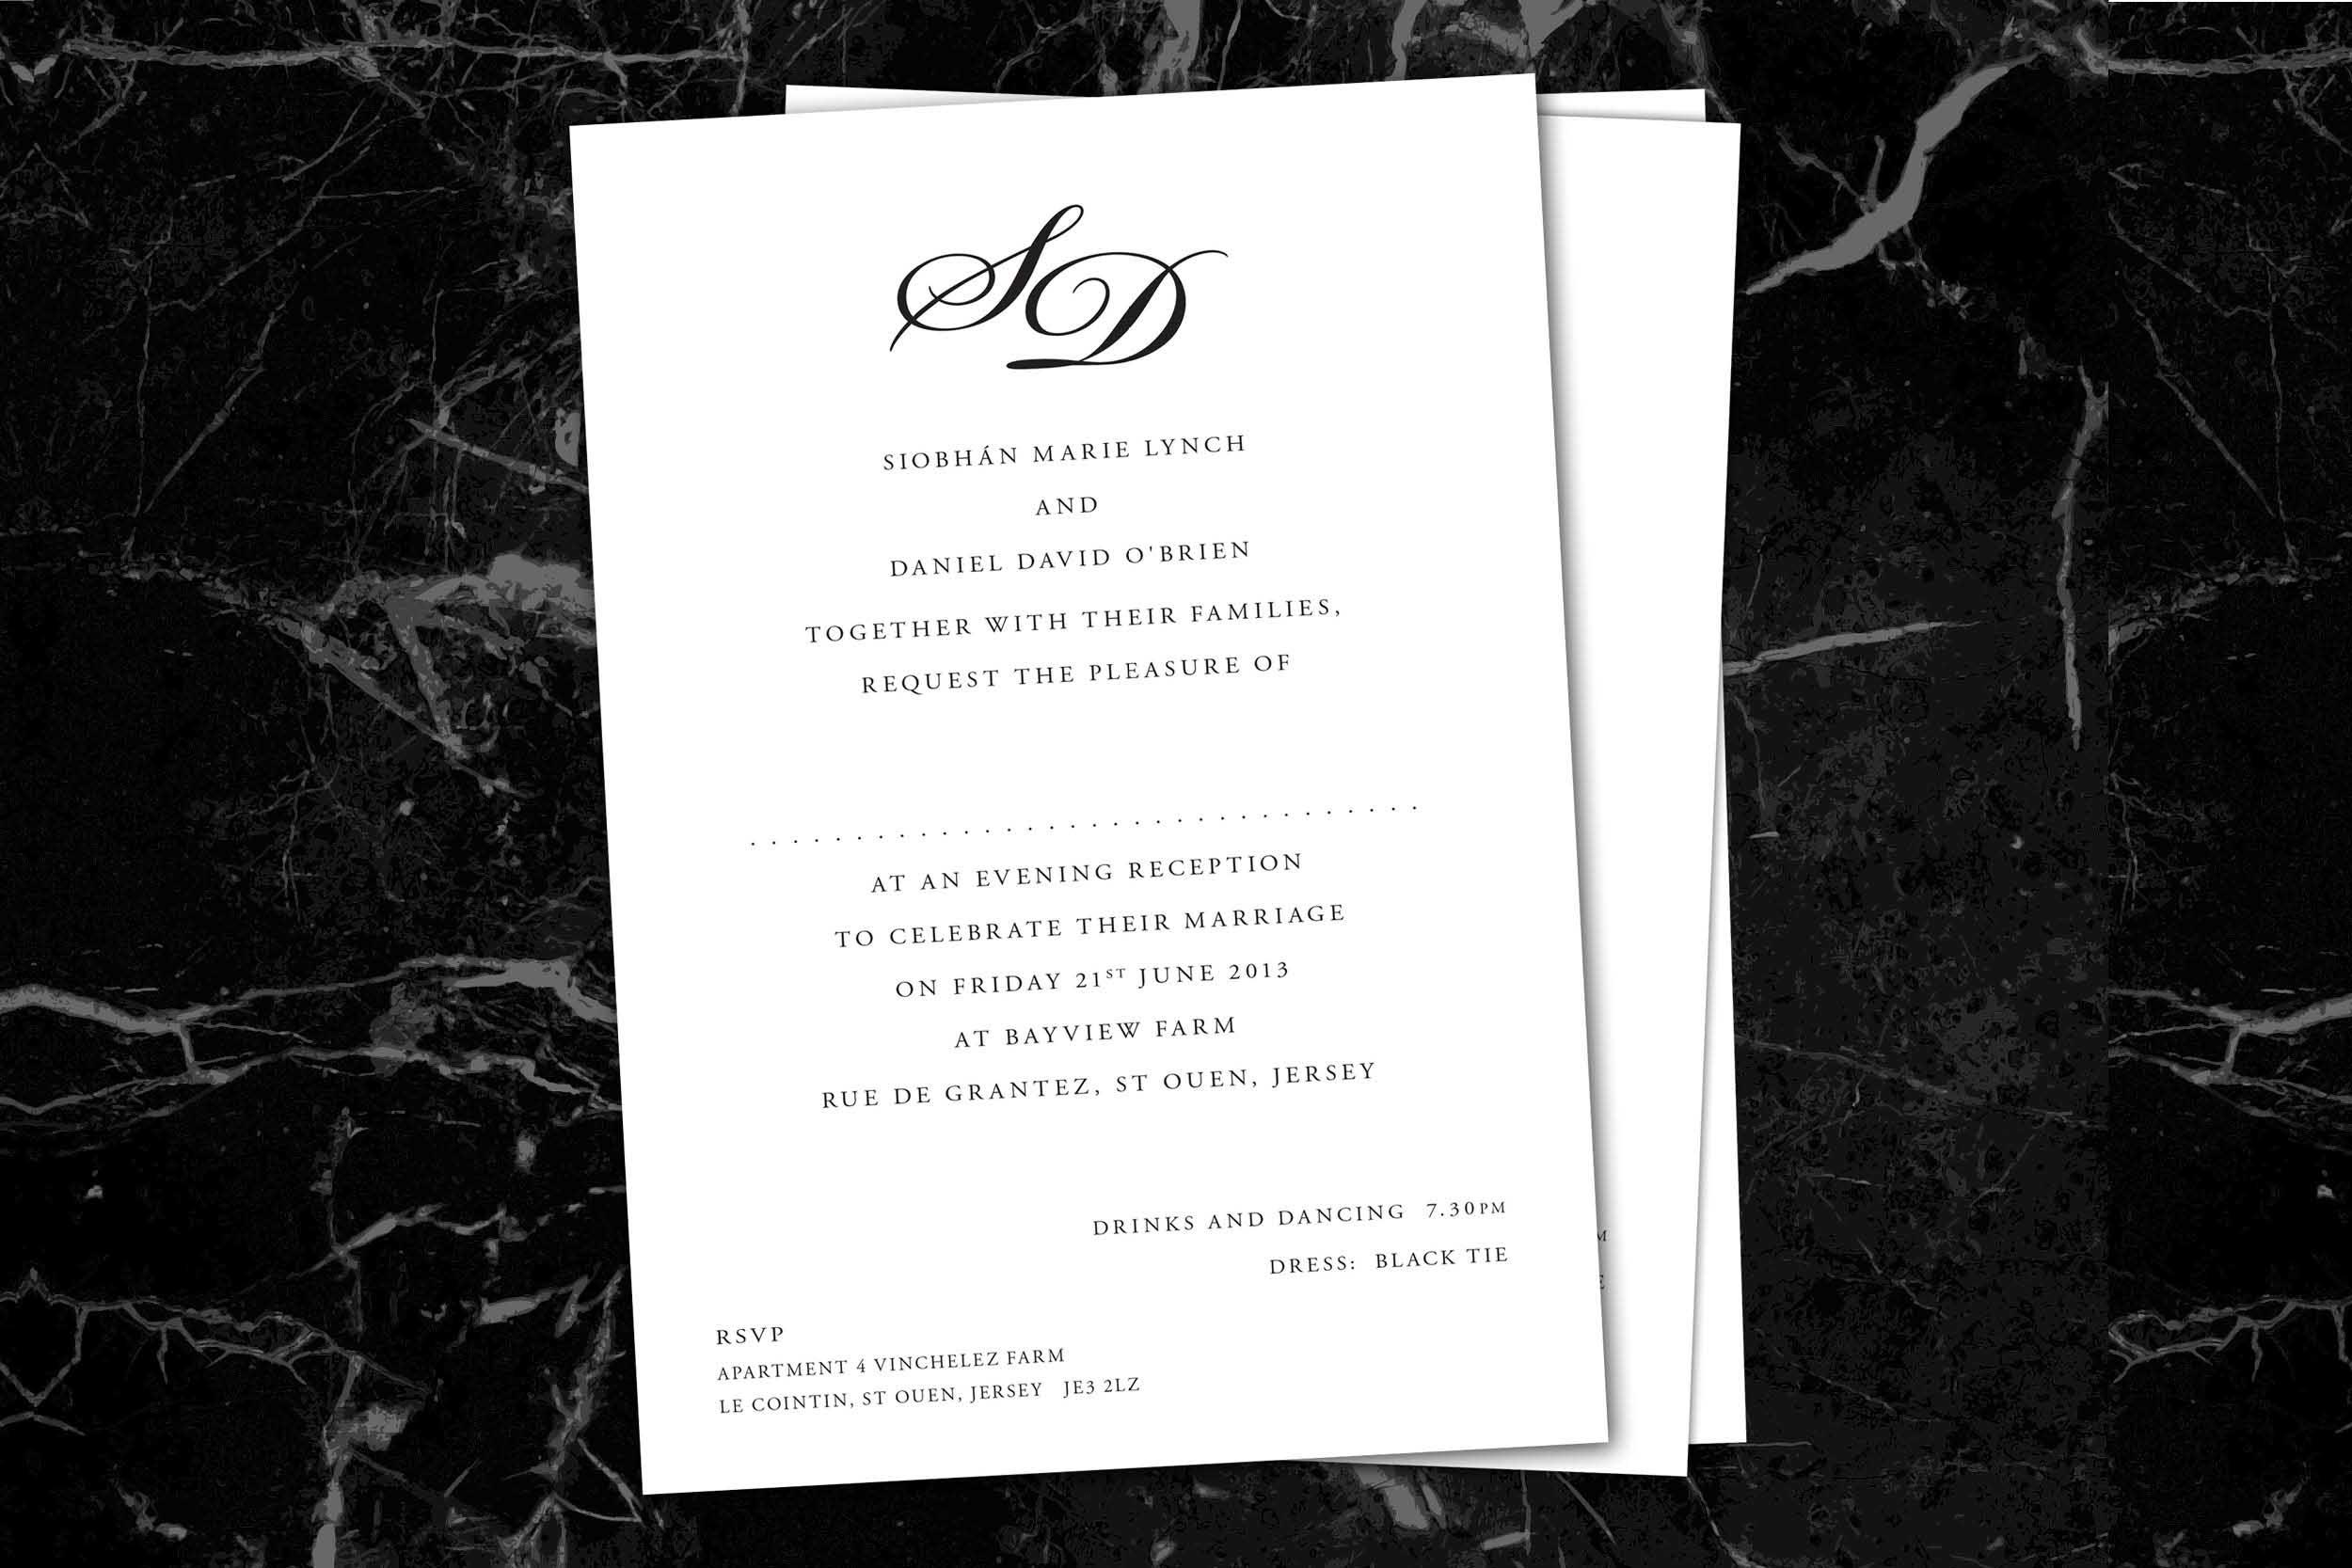 Monochrome_monogram evening wedding reception invitations_ananyacards.com.jpg